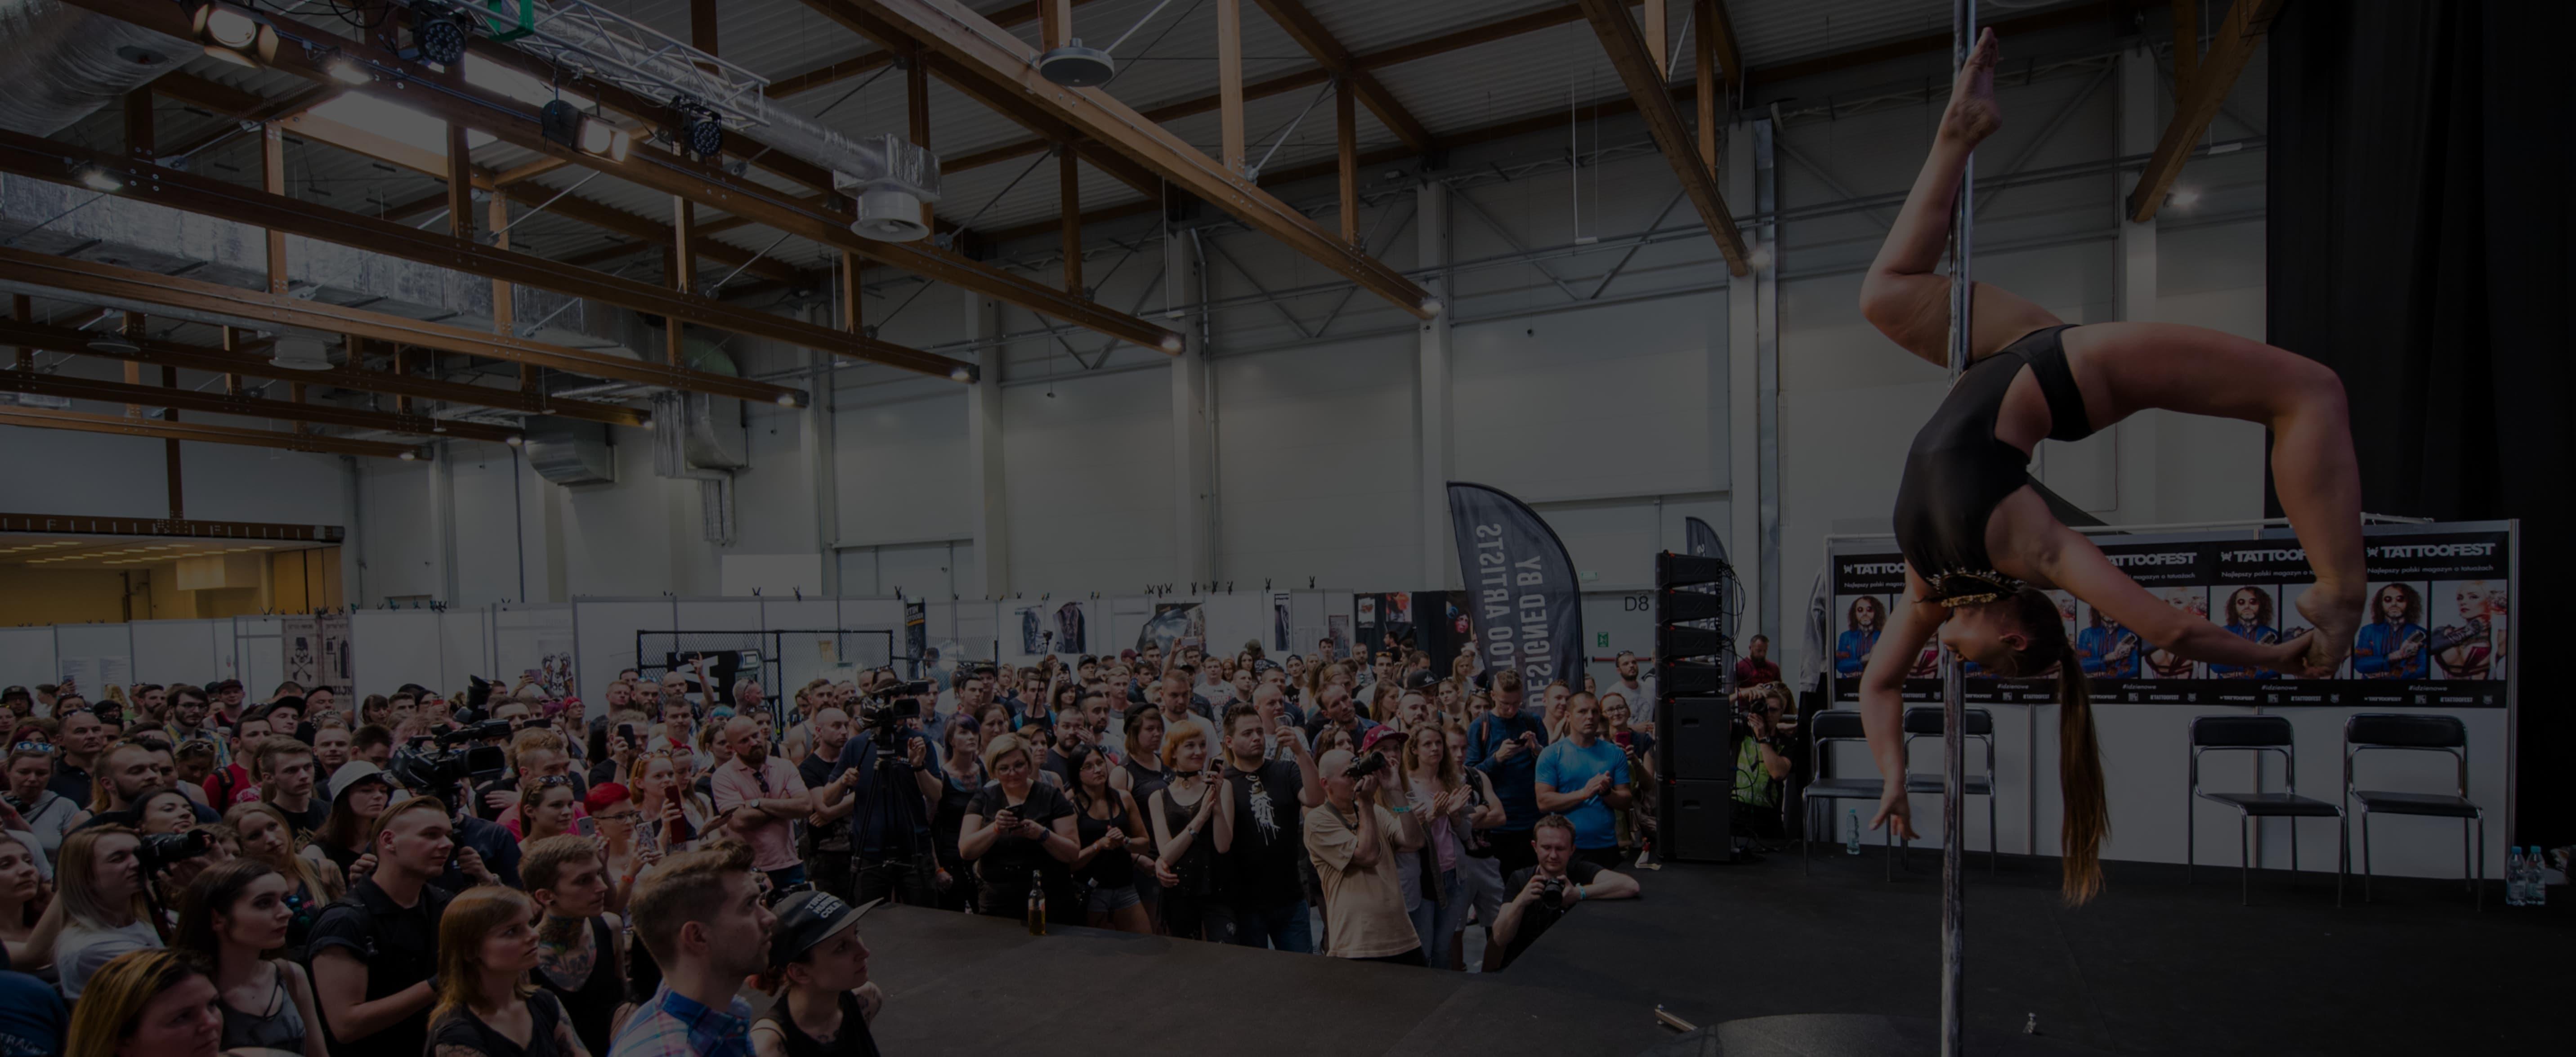 Goscie i Atrakcje - Tattoofest Convention Festiwal Tatuazu 2018 Krakow